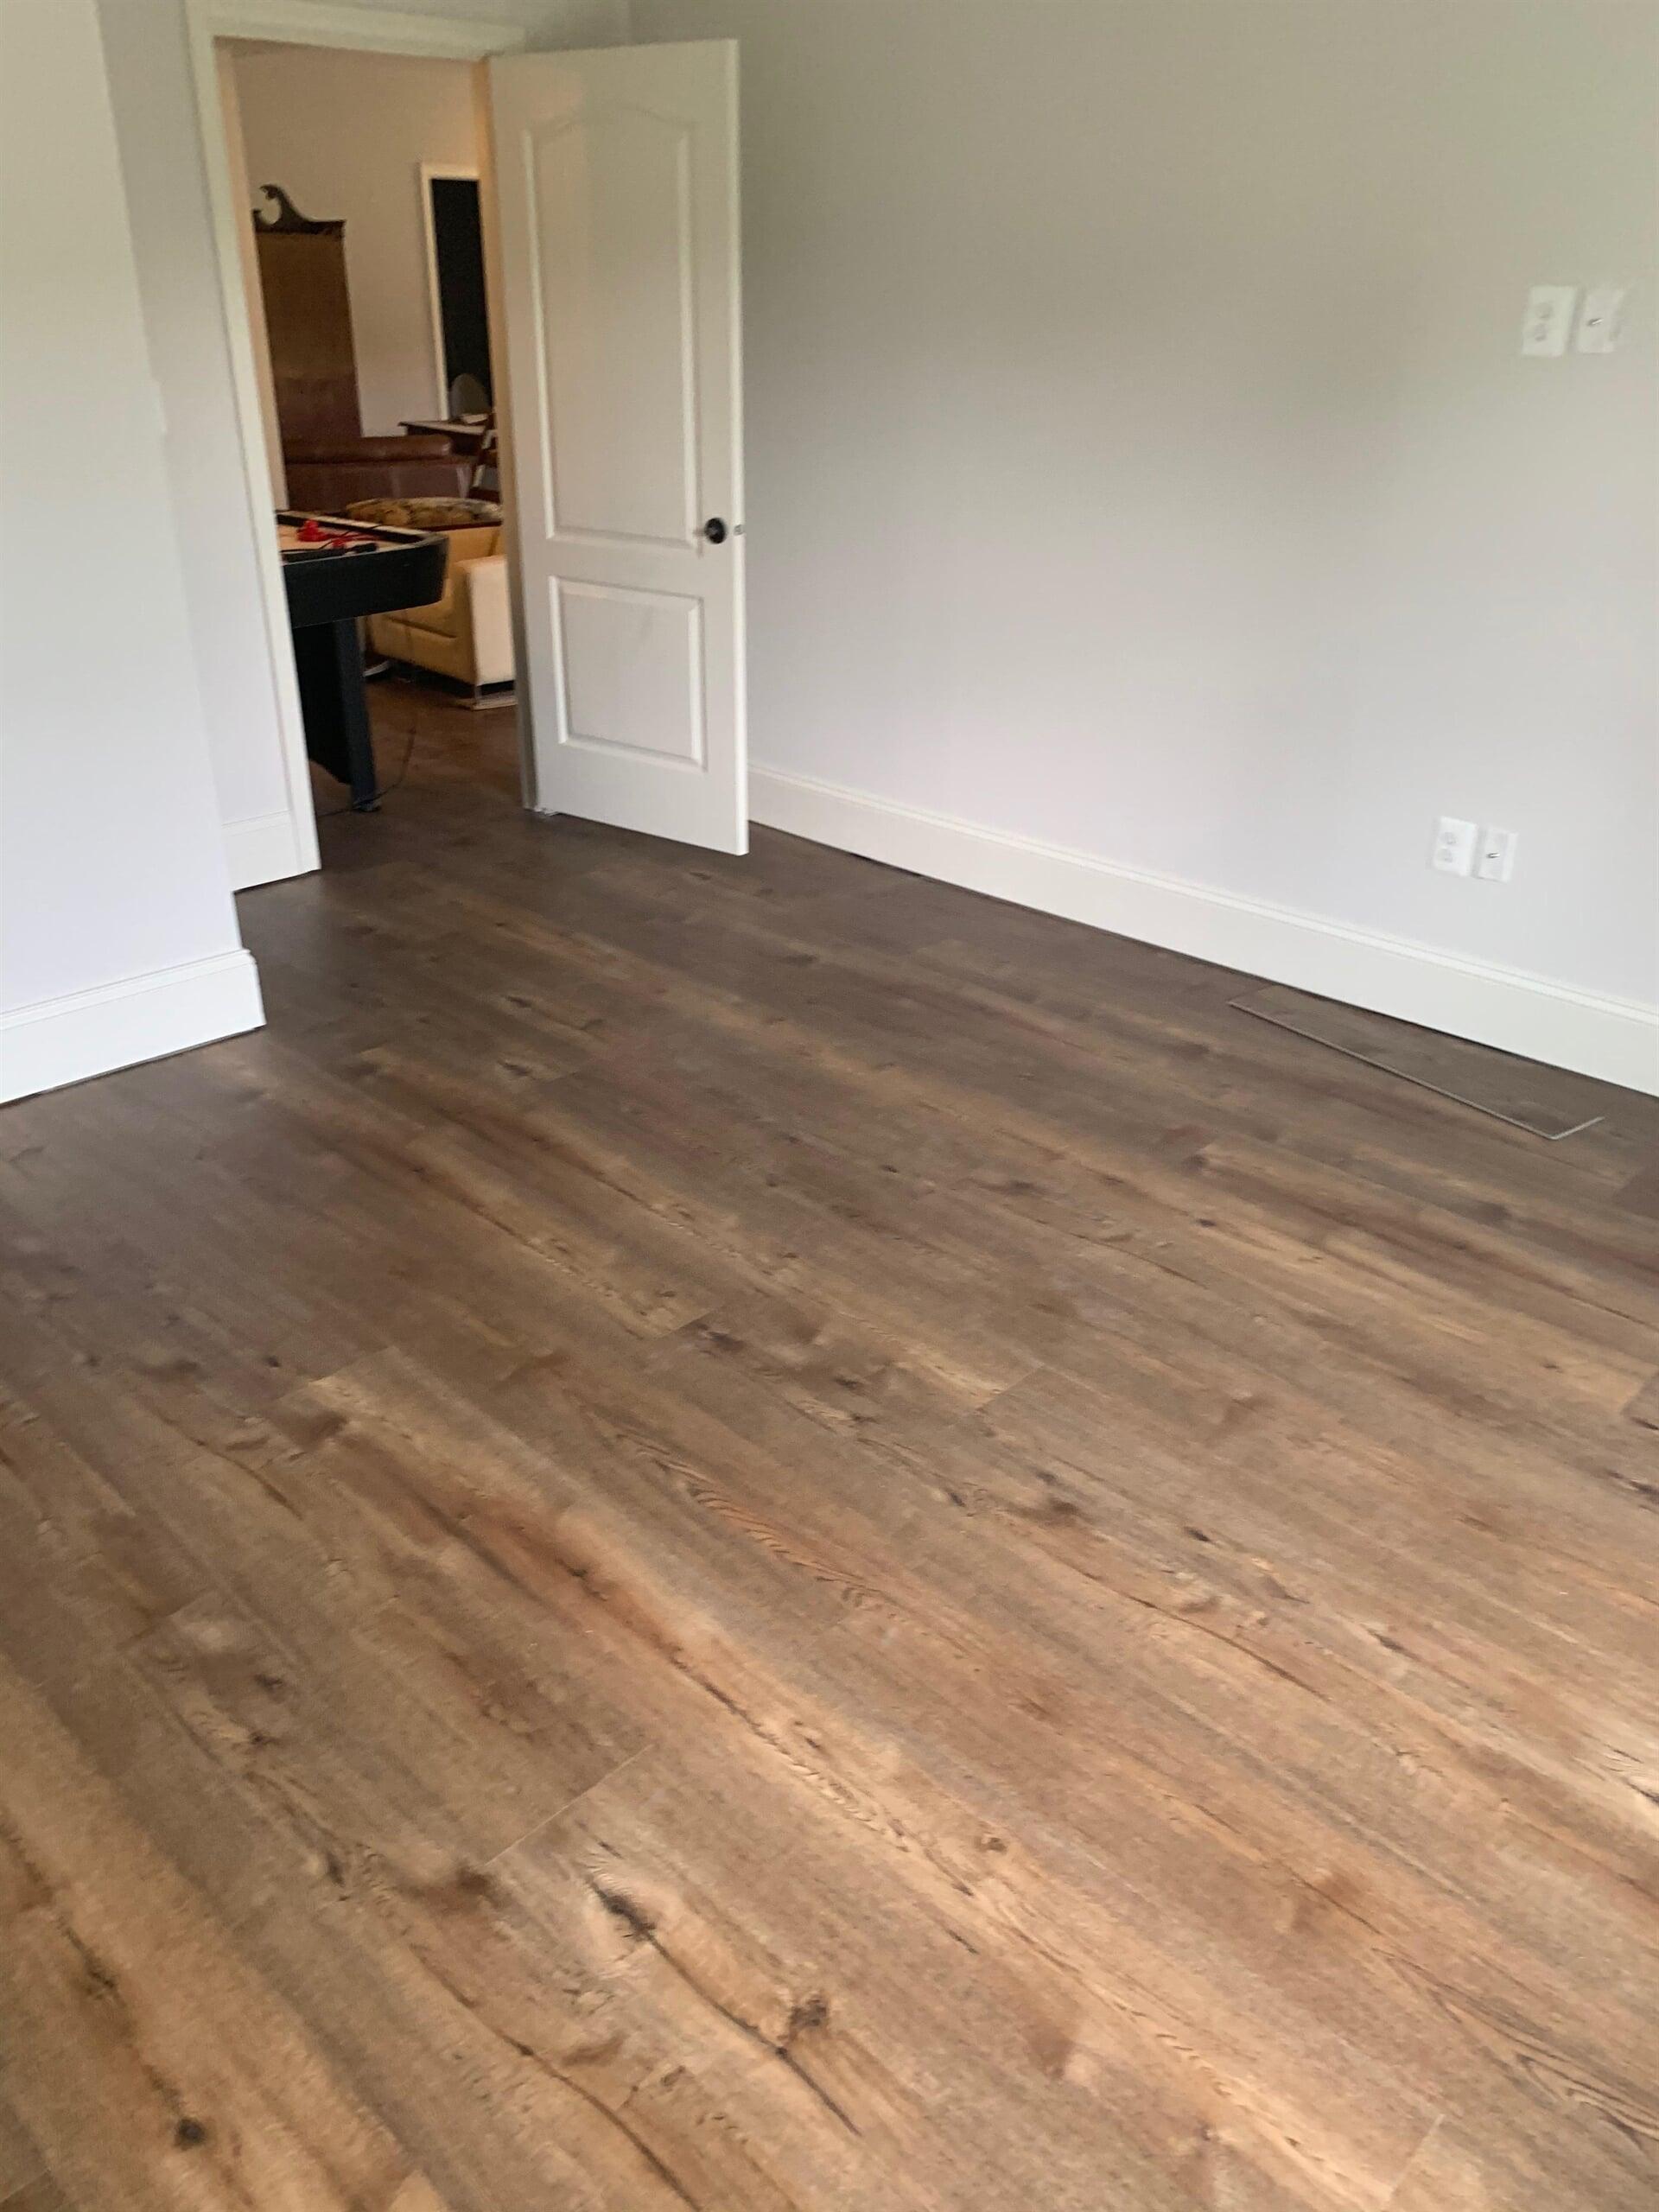 Modern hardwood flooring in Rockville, MD from Carpet & Floor Express